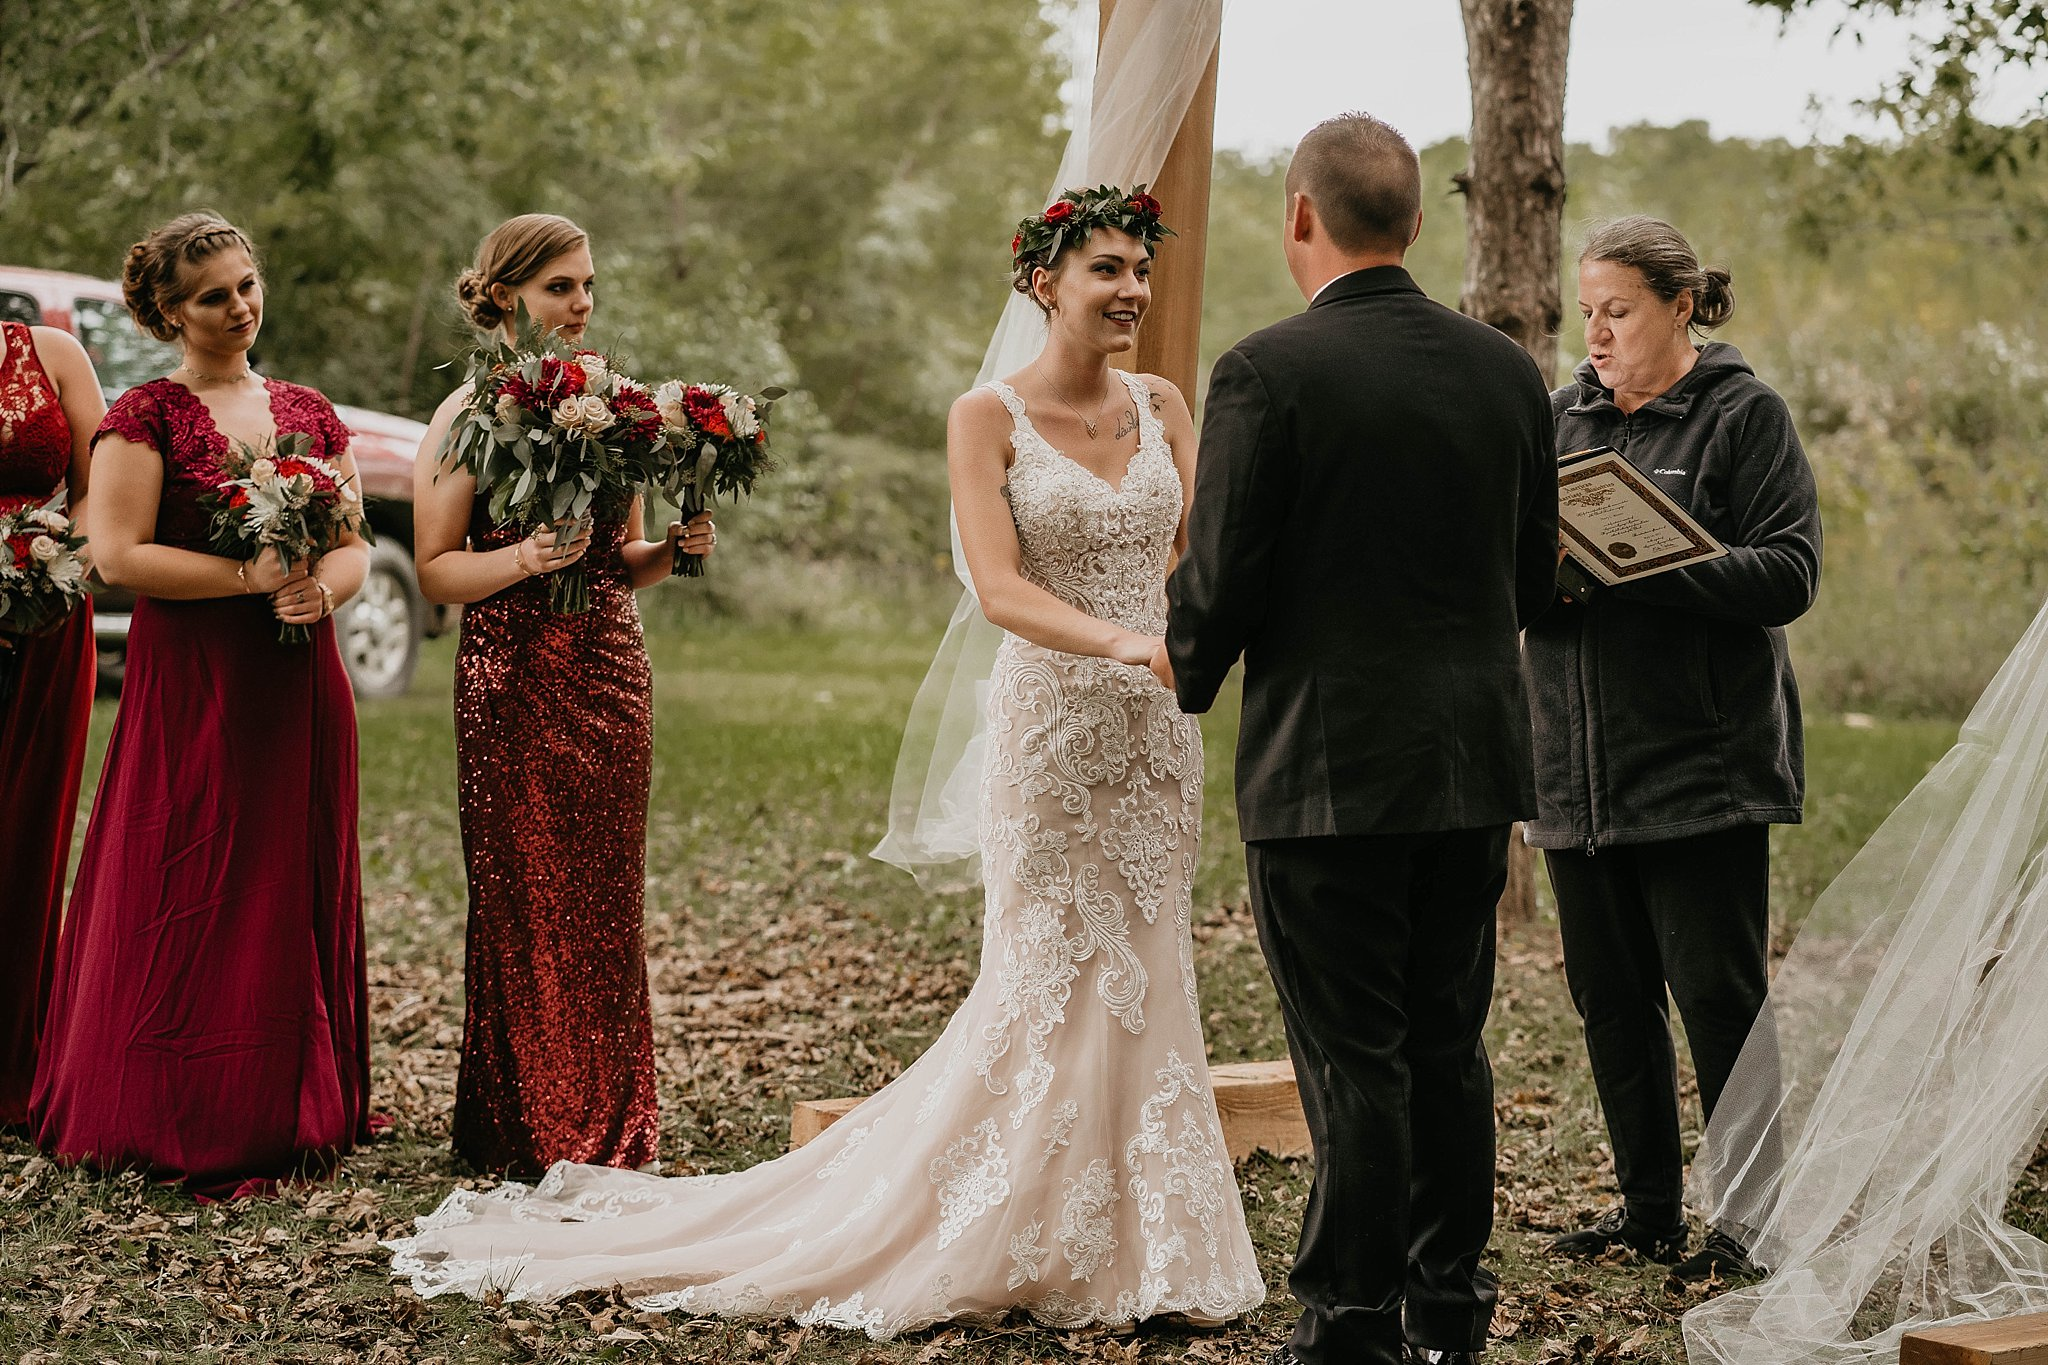 DesMoines-Iowa-Wedding-Photography-Destination-Photographer_0121.jpg